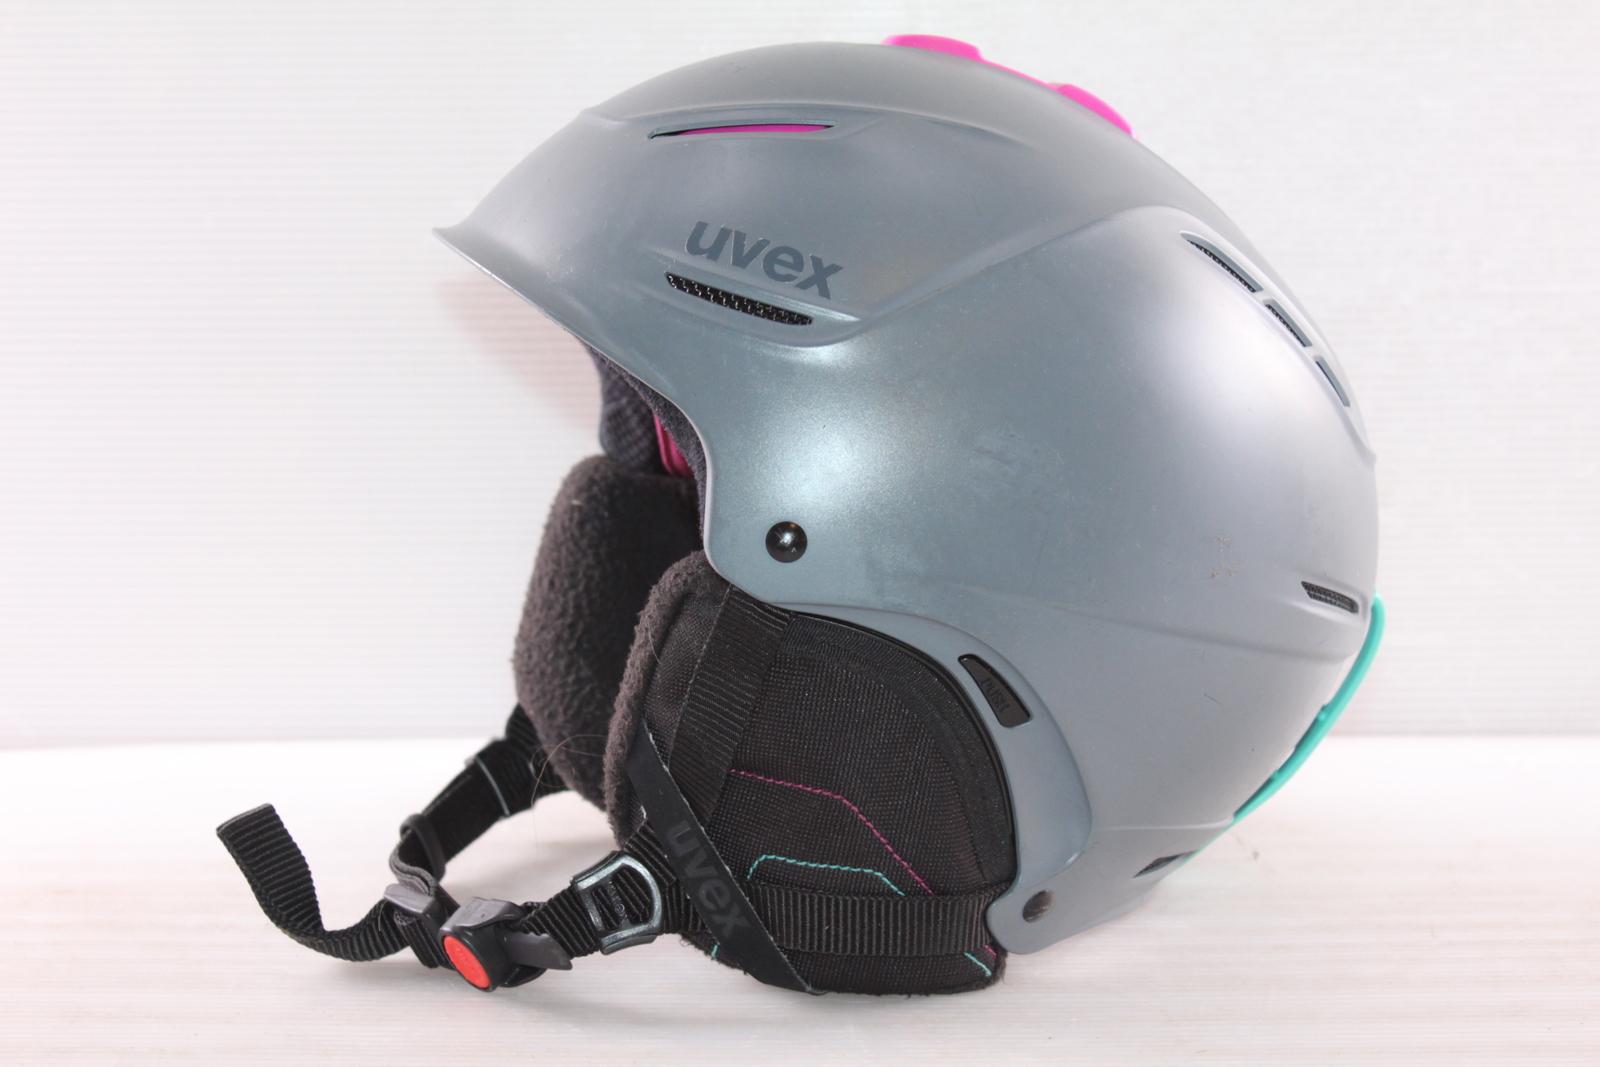 Dětská lyžařská helma Uvex Uvex - posuvná vel. 53 - 55